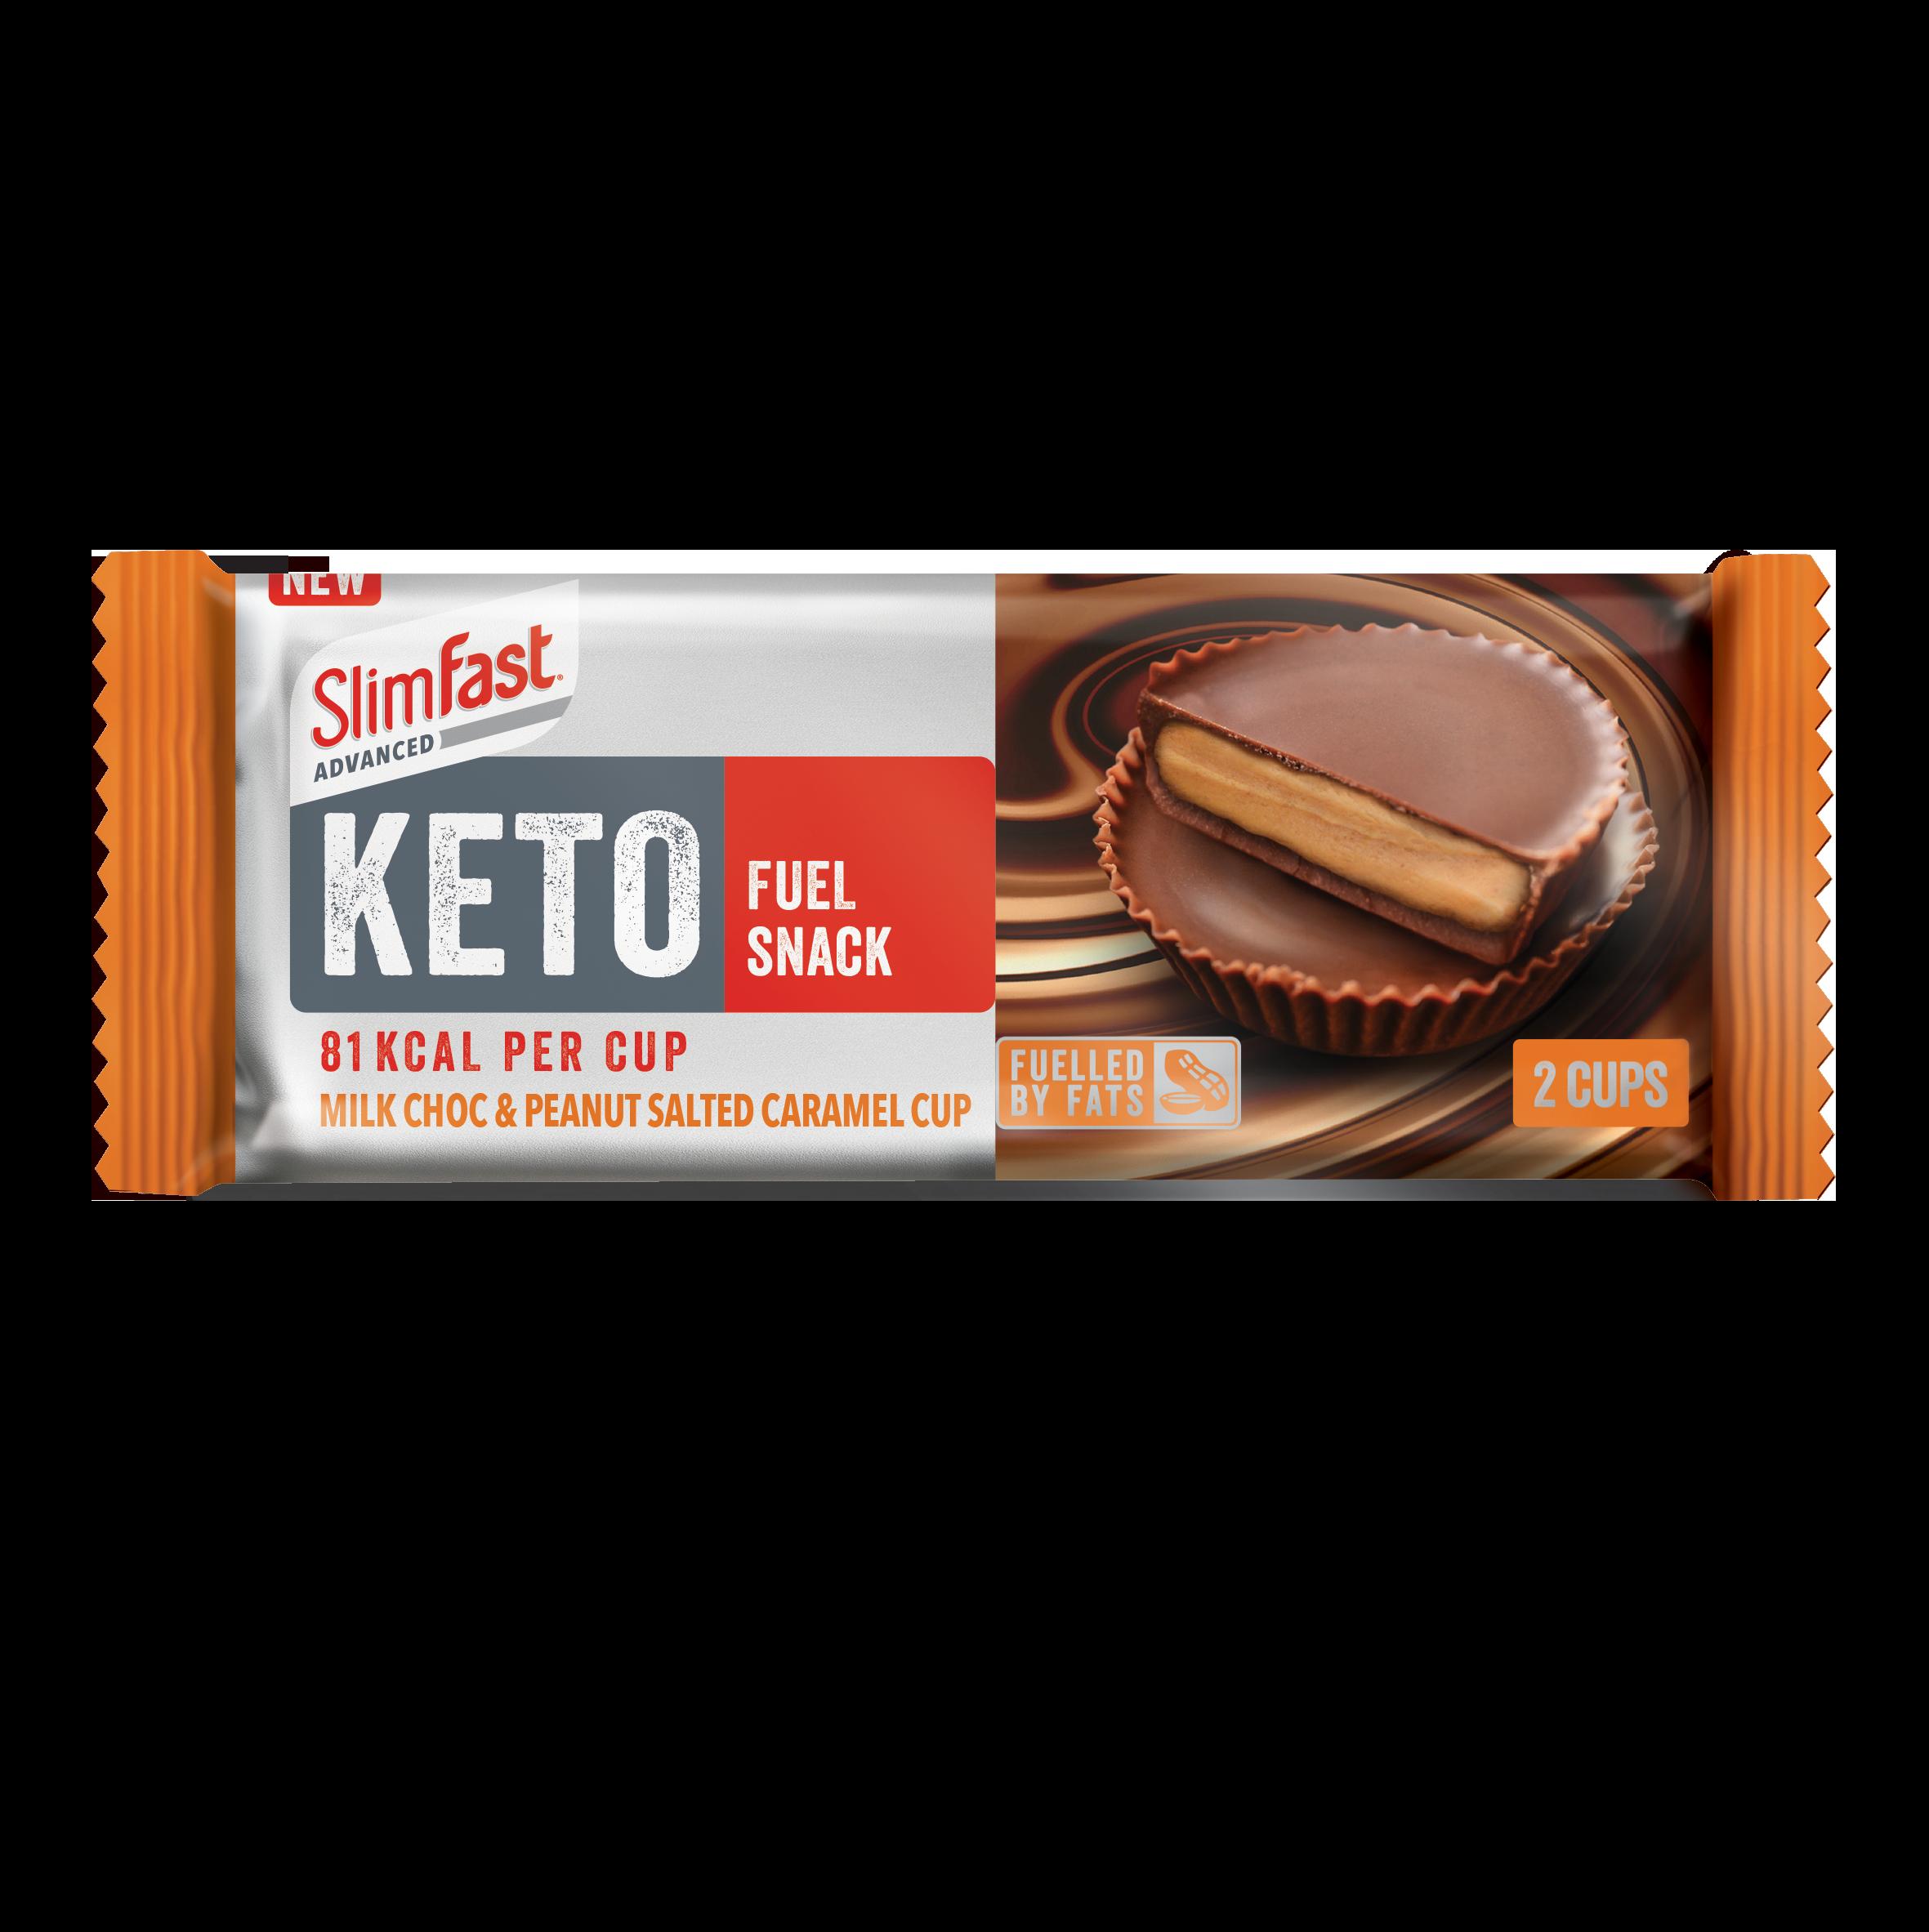 Milk Choc Peanut Salted Caramel Keto Fuel Snack